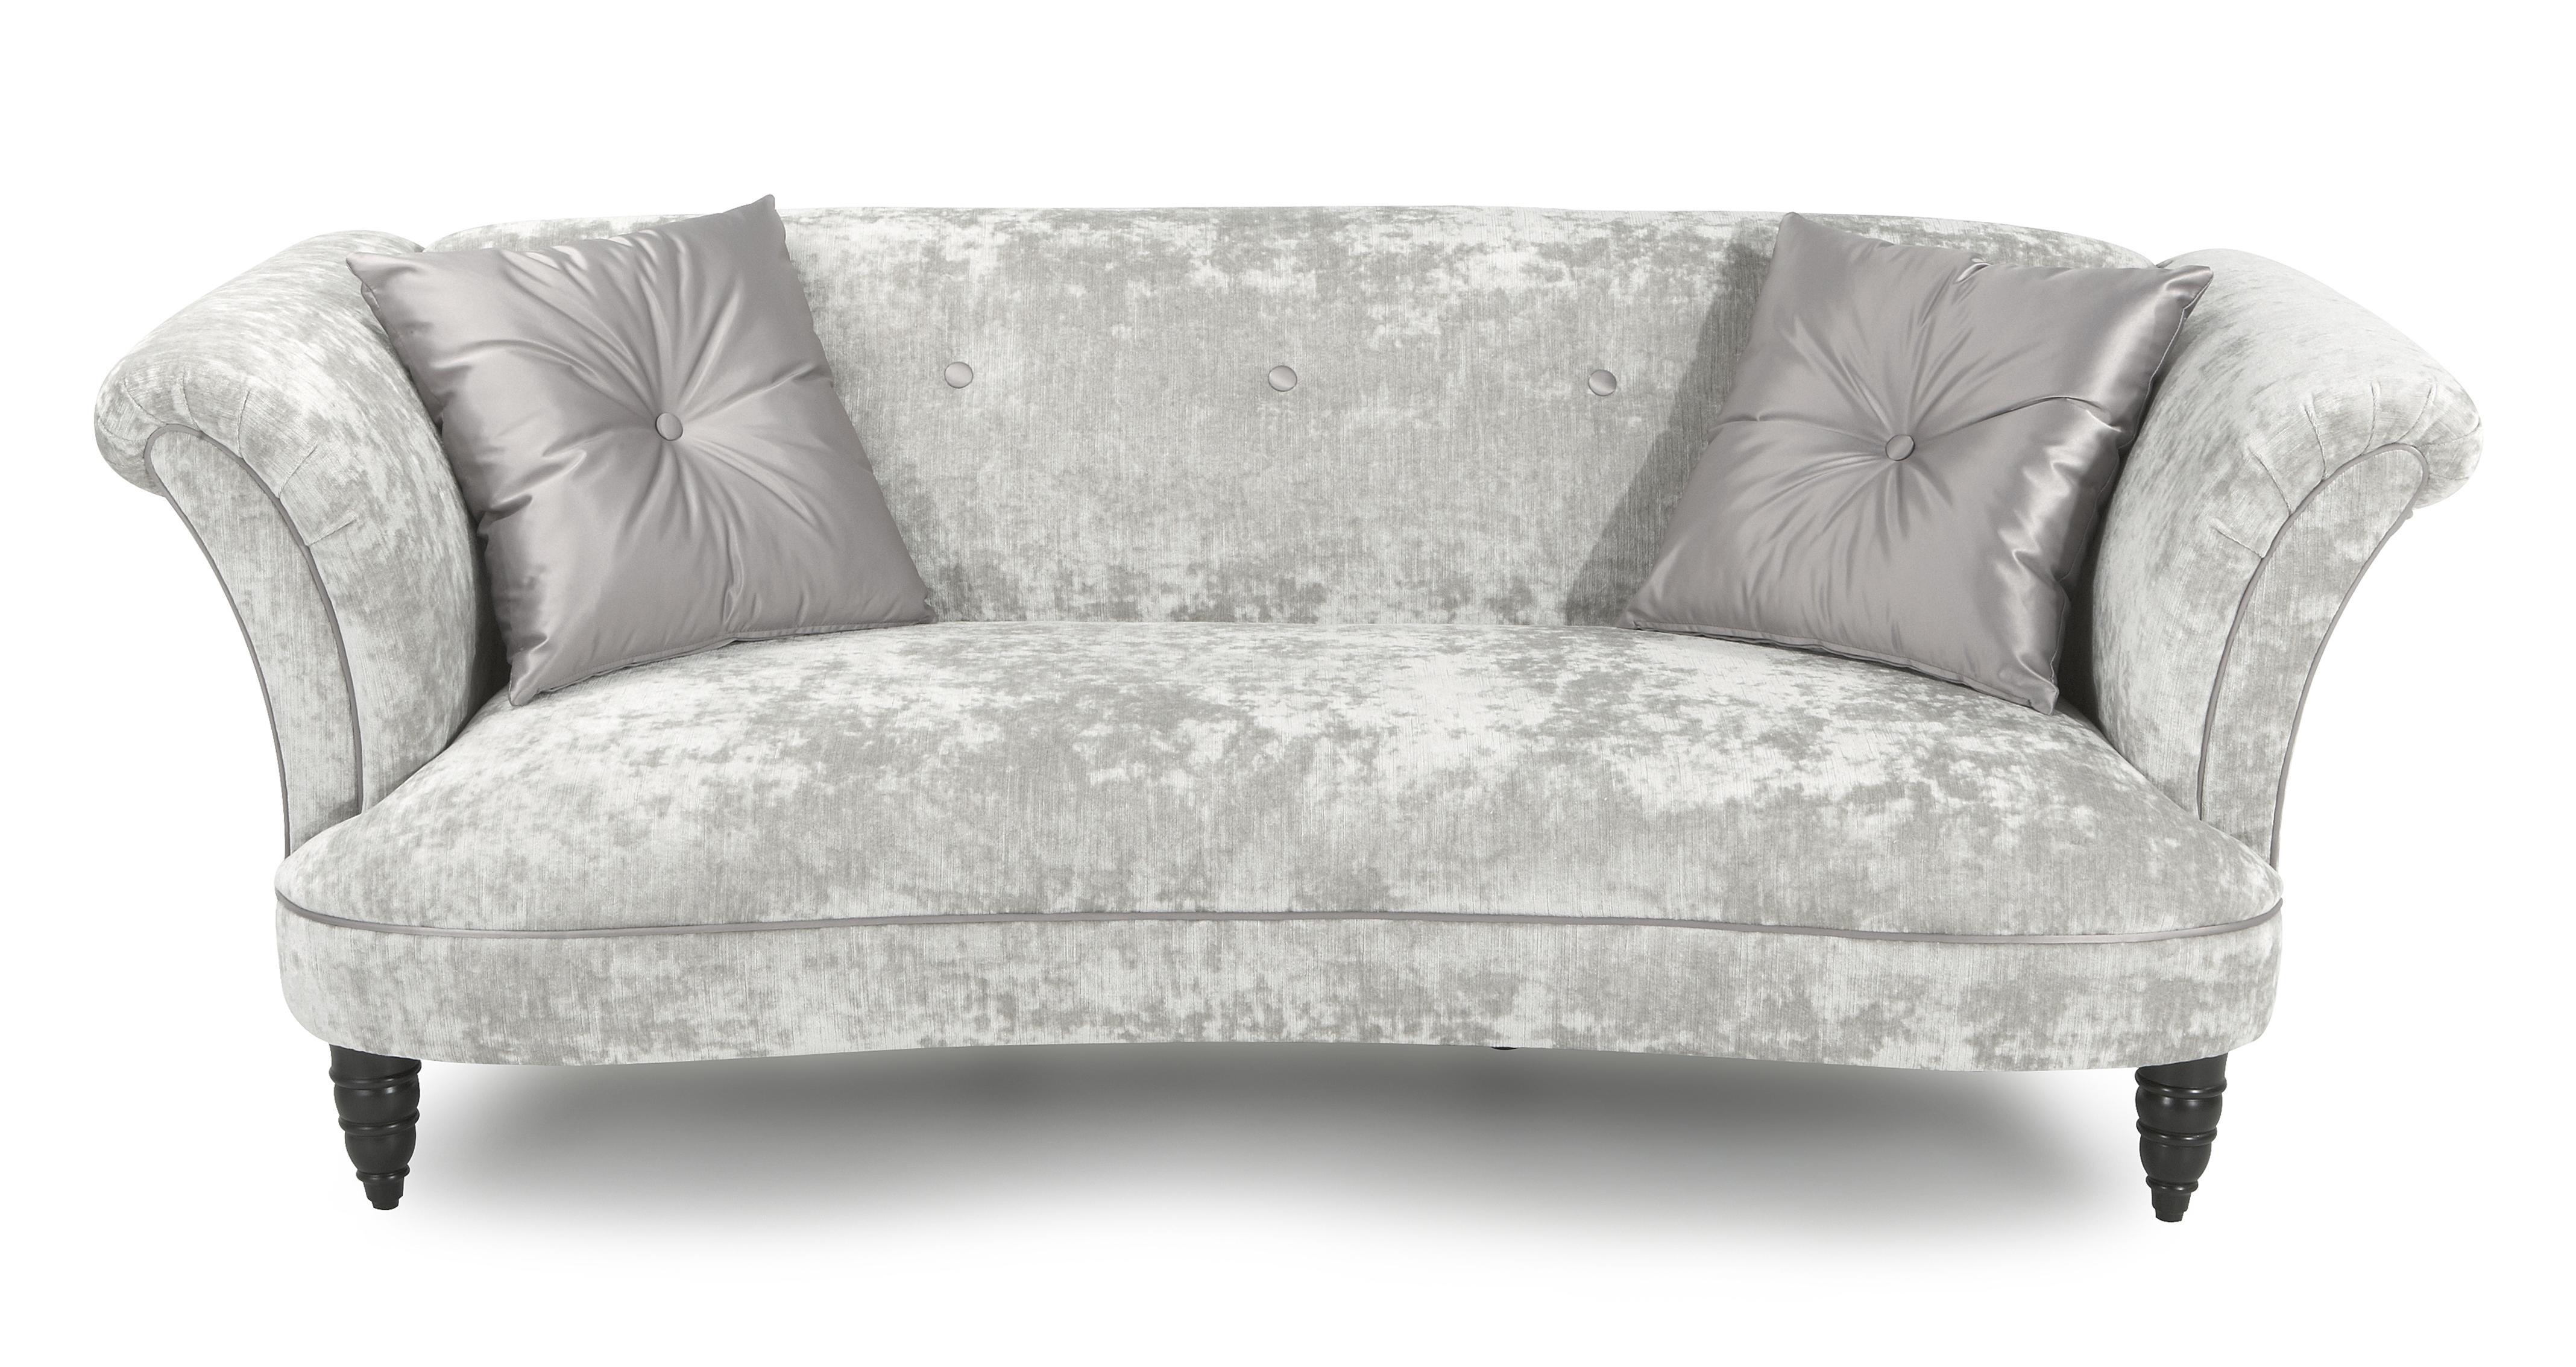 dfs moray sofa reviews modern set table designs concerto 3 seater